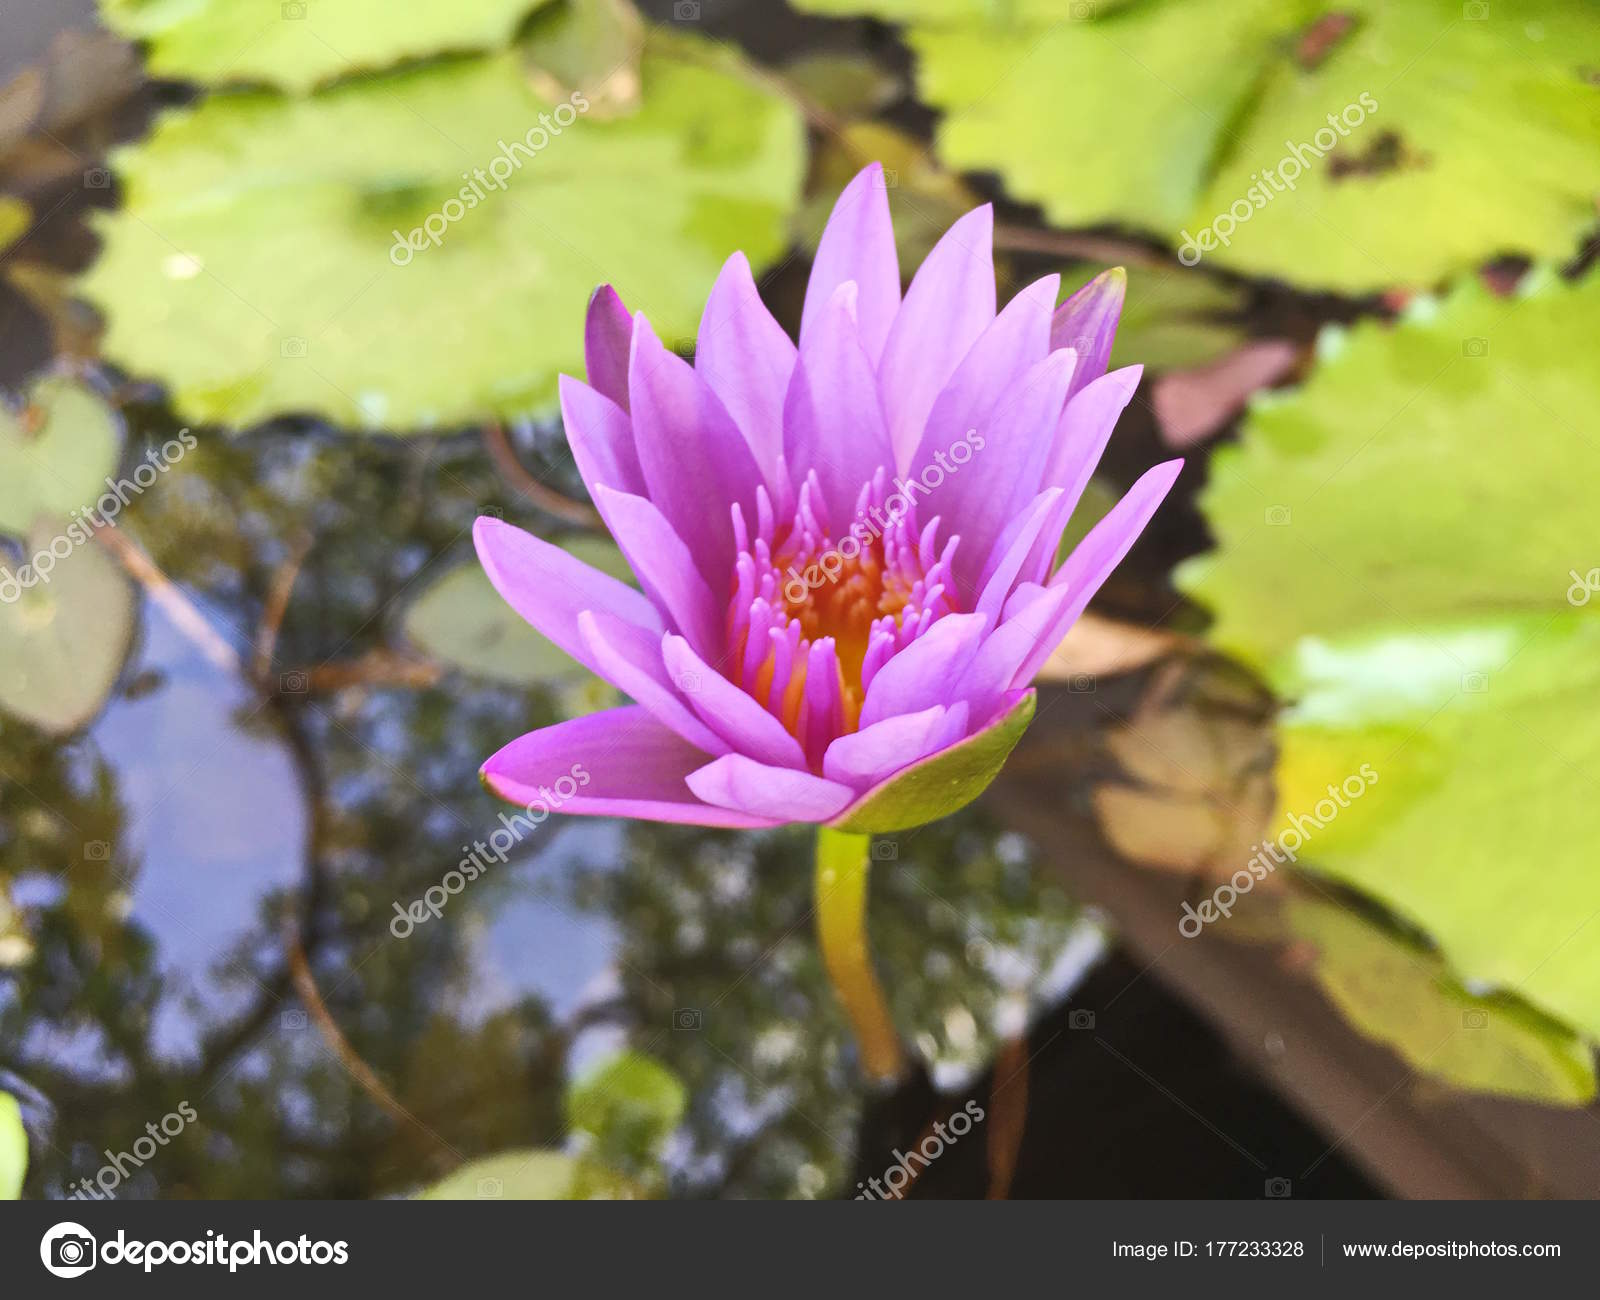 Lotus Flower Blooming Purple In The Garden Stock Photo